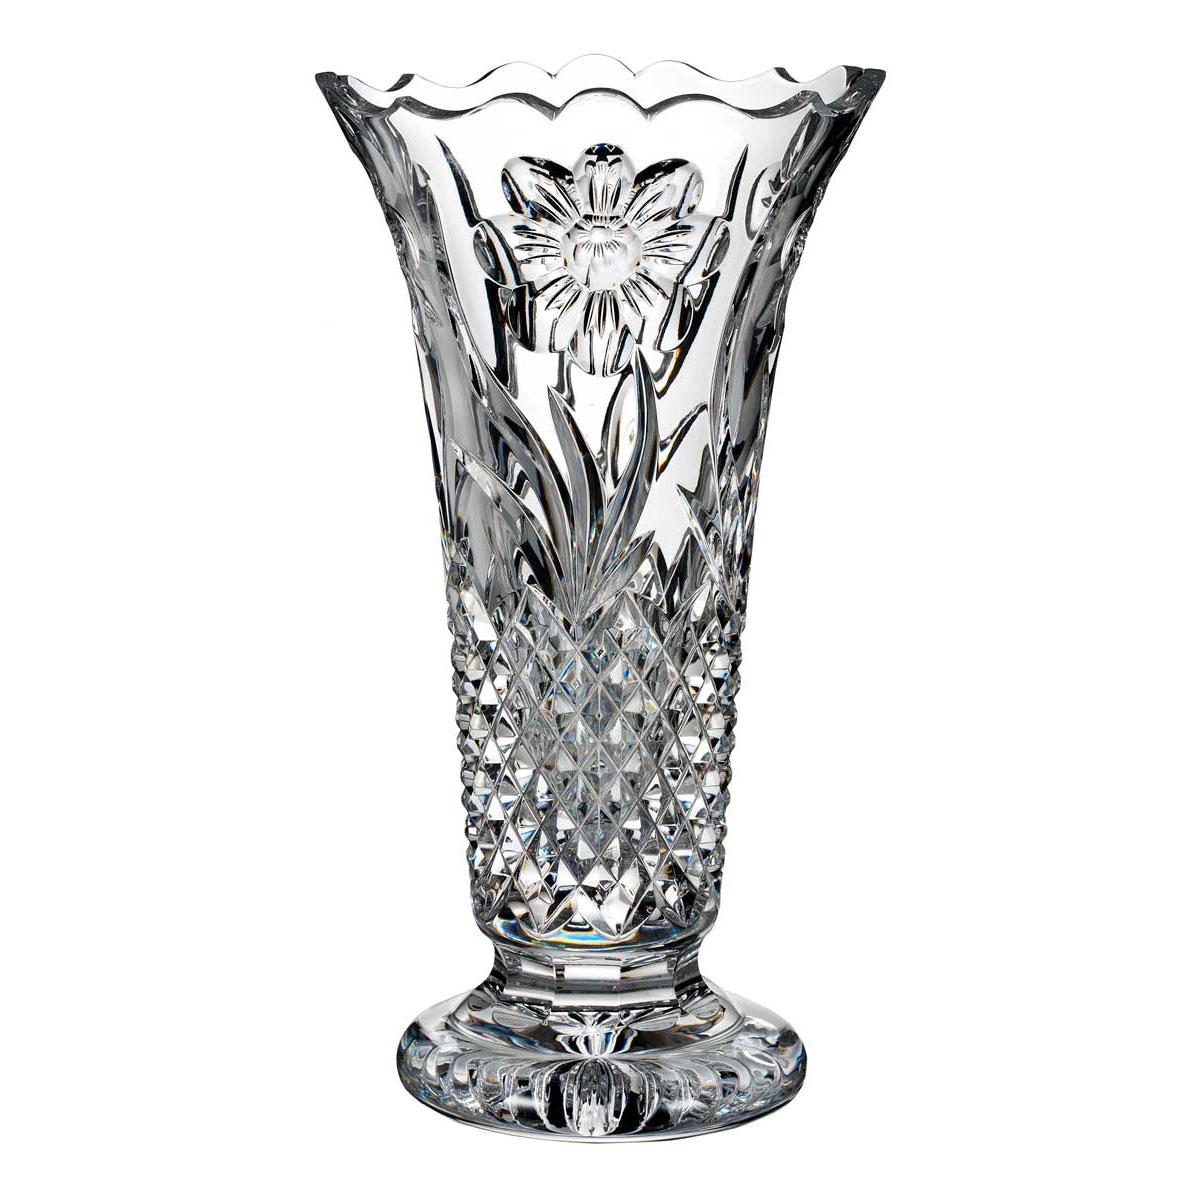 "Waterford Crystal, House of Waterford Magnolia 12"" Crystal Vase"